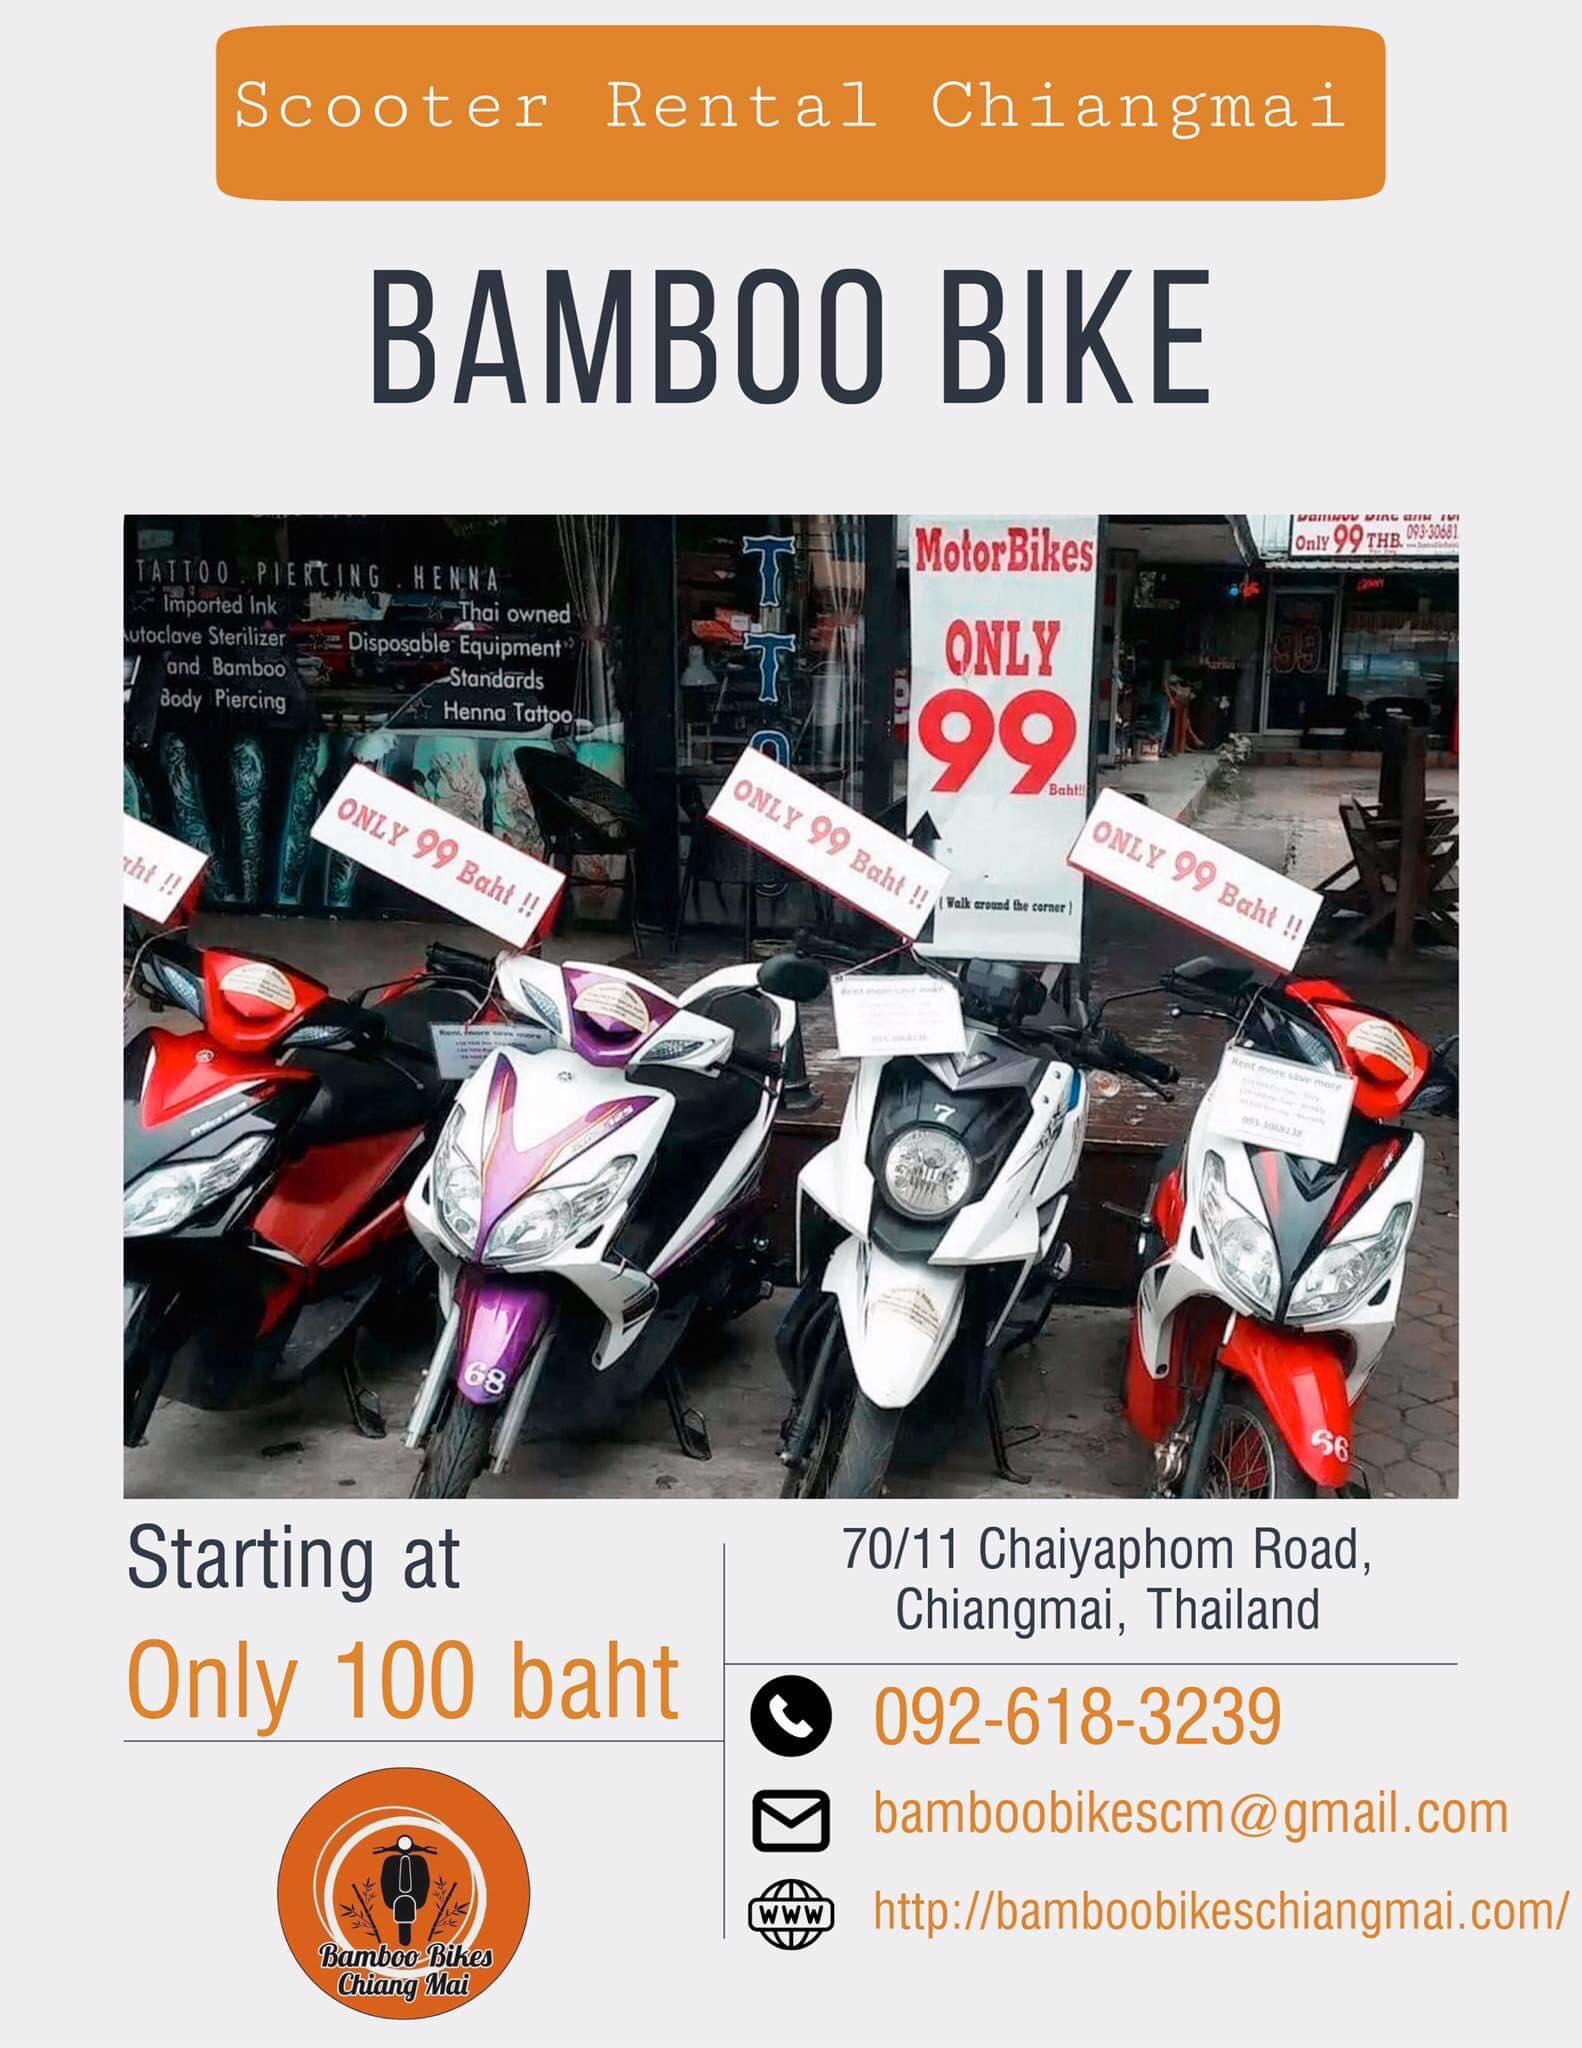 Bamboo Bikes Chiang Mai